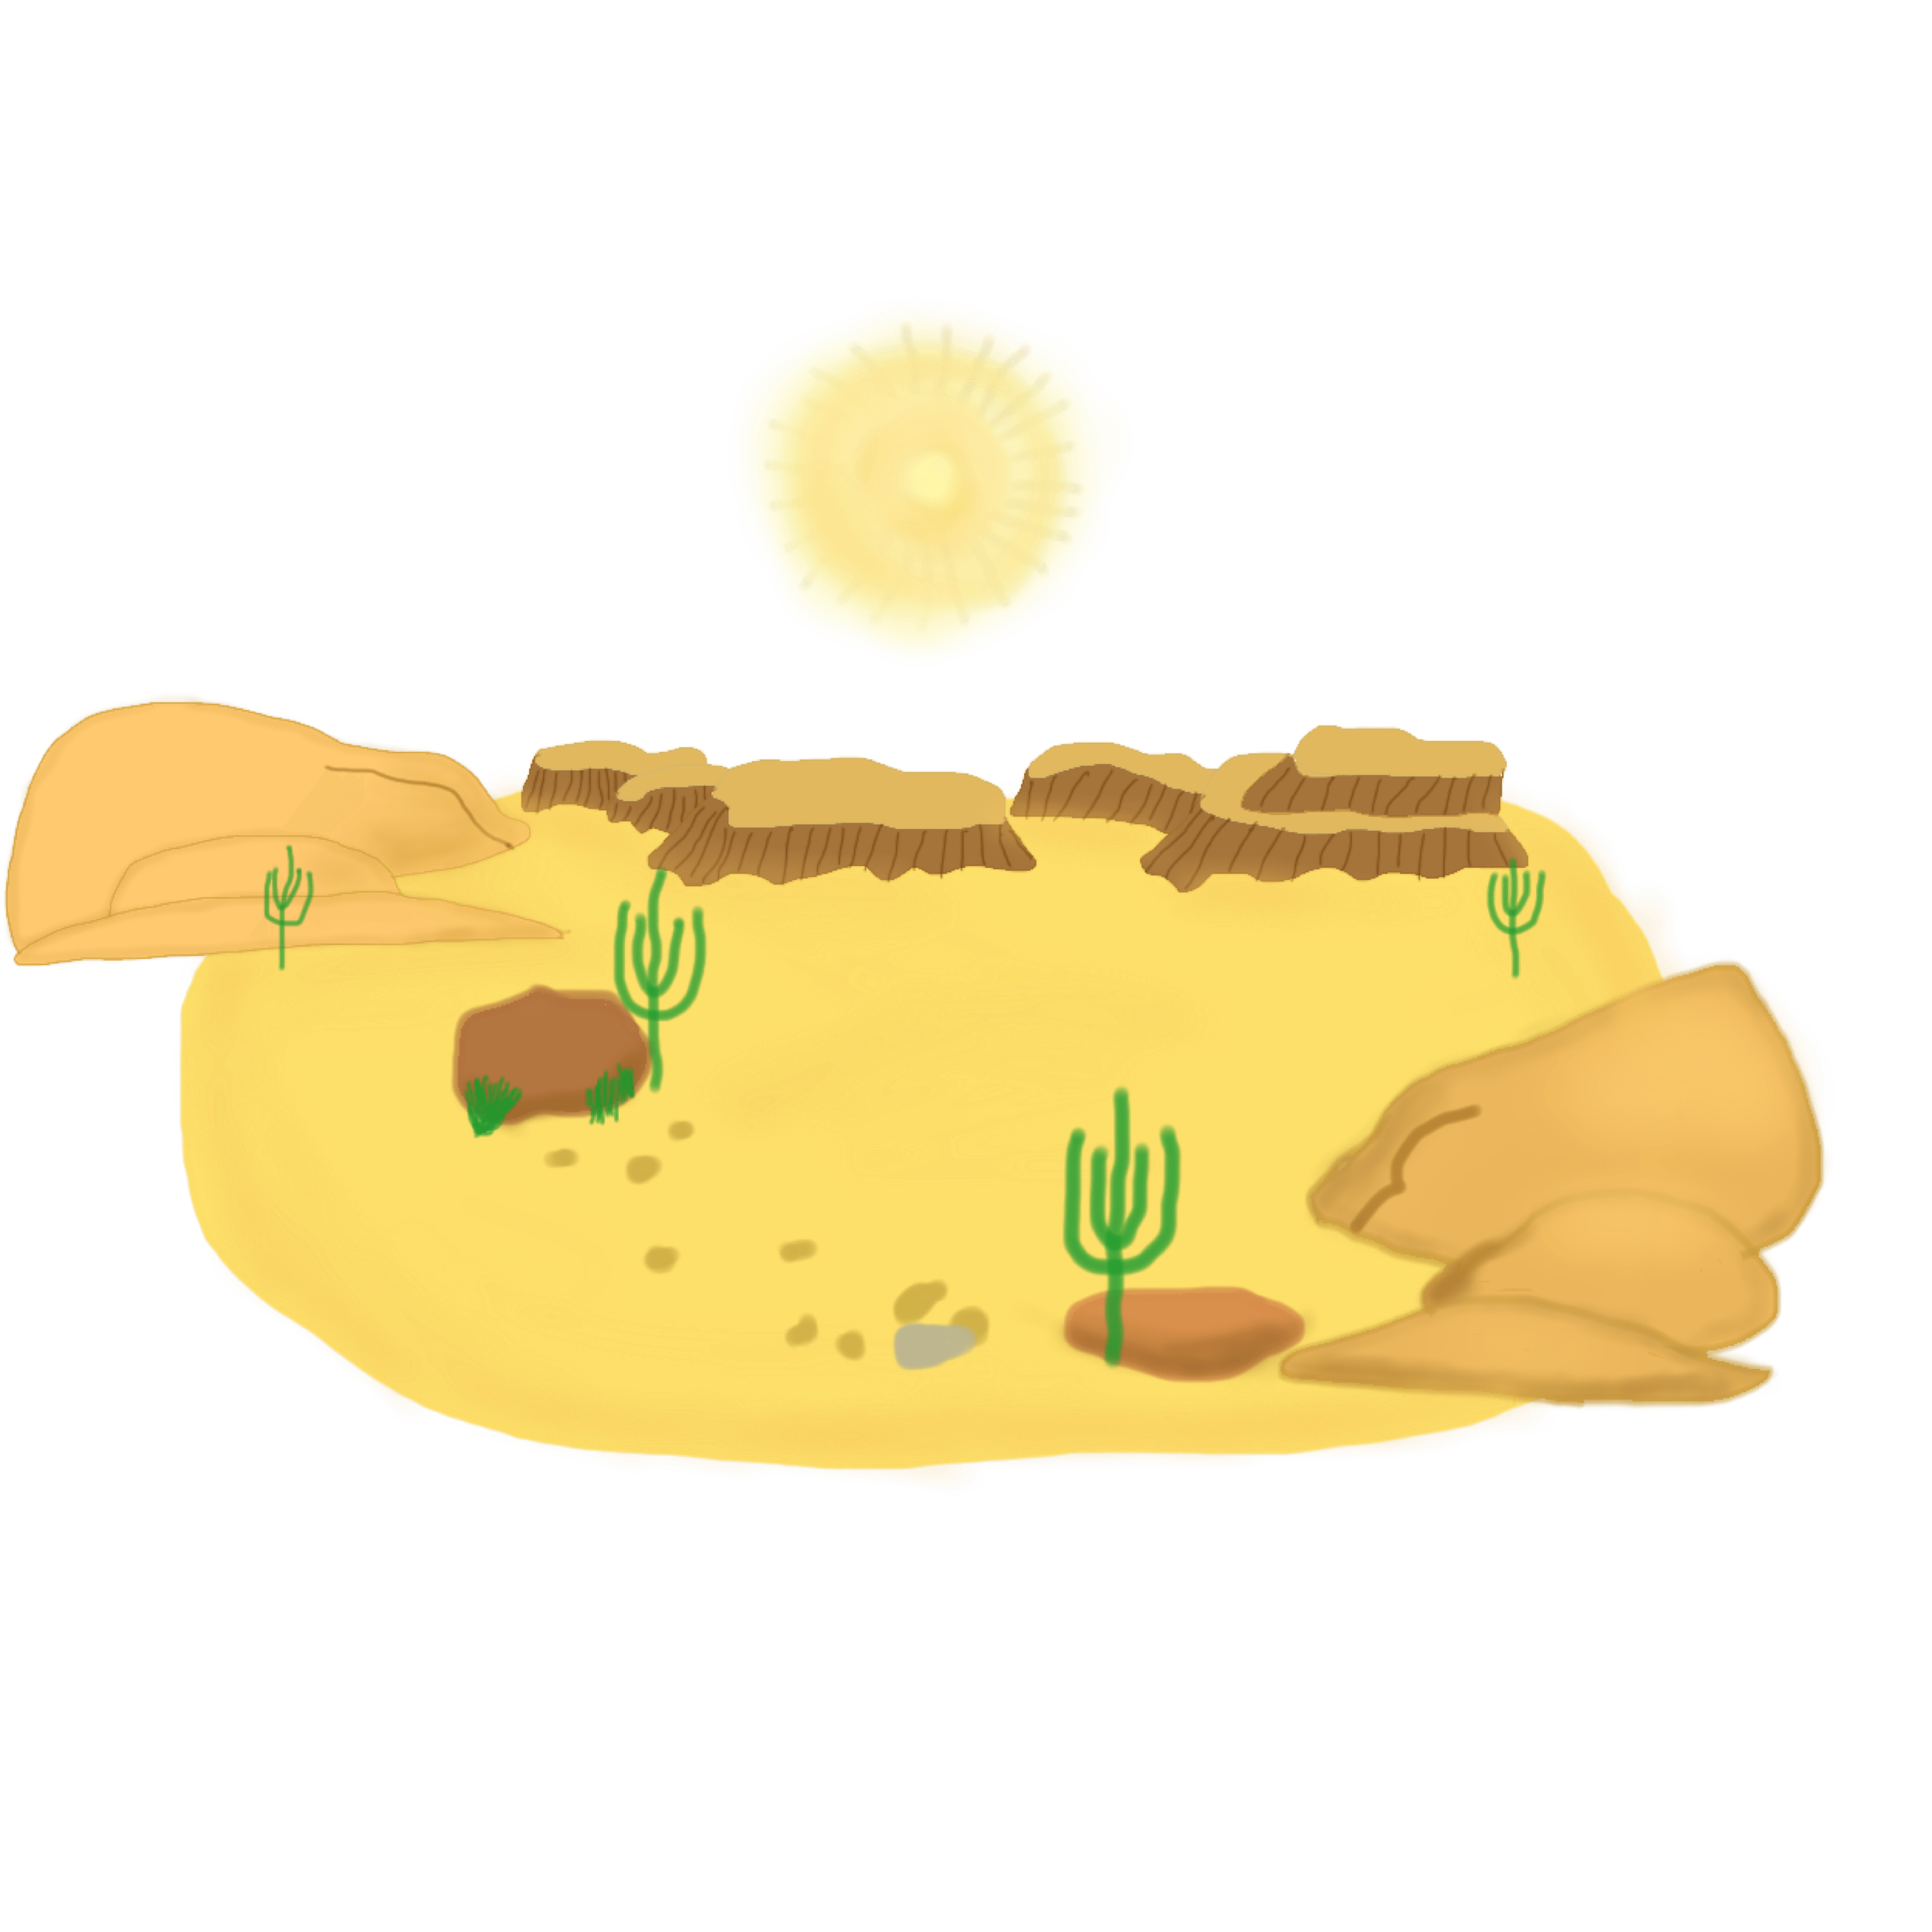 Desert clipart forest habitat. Ecosystem group hanslodge cliparts